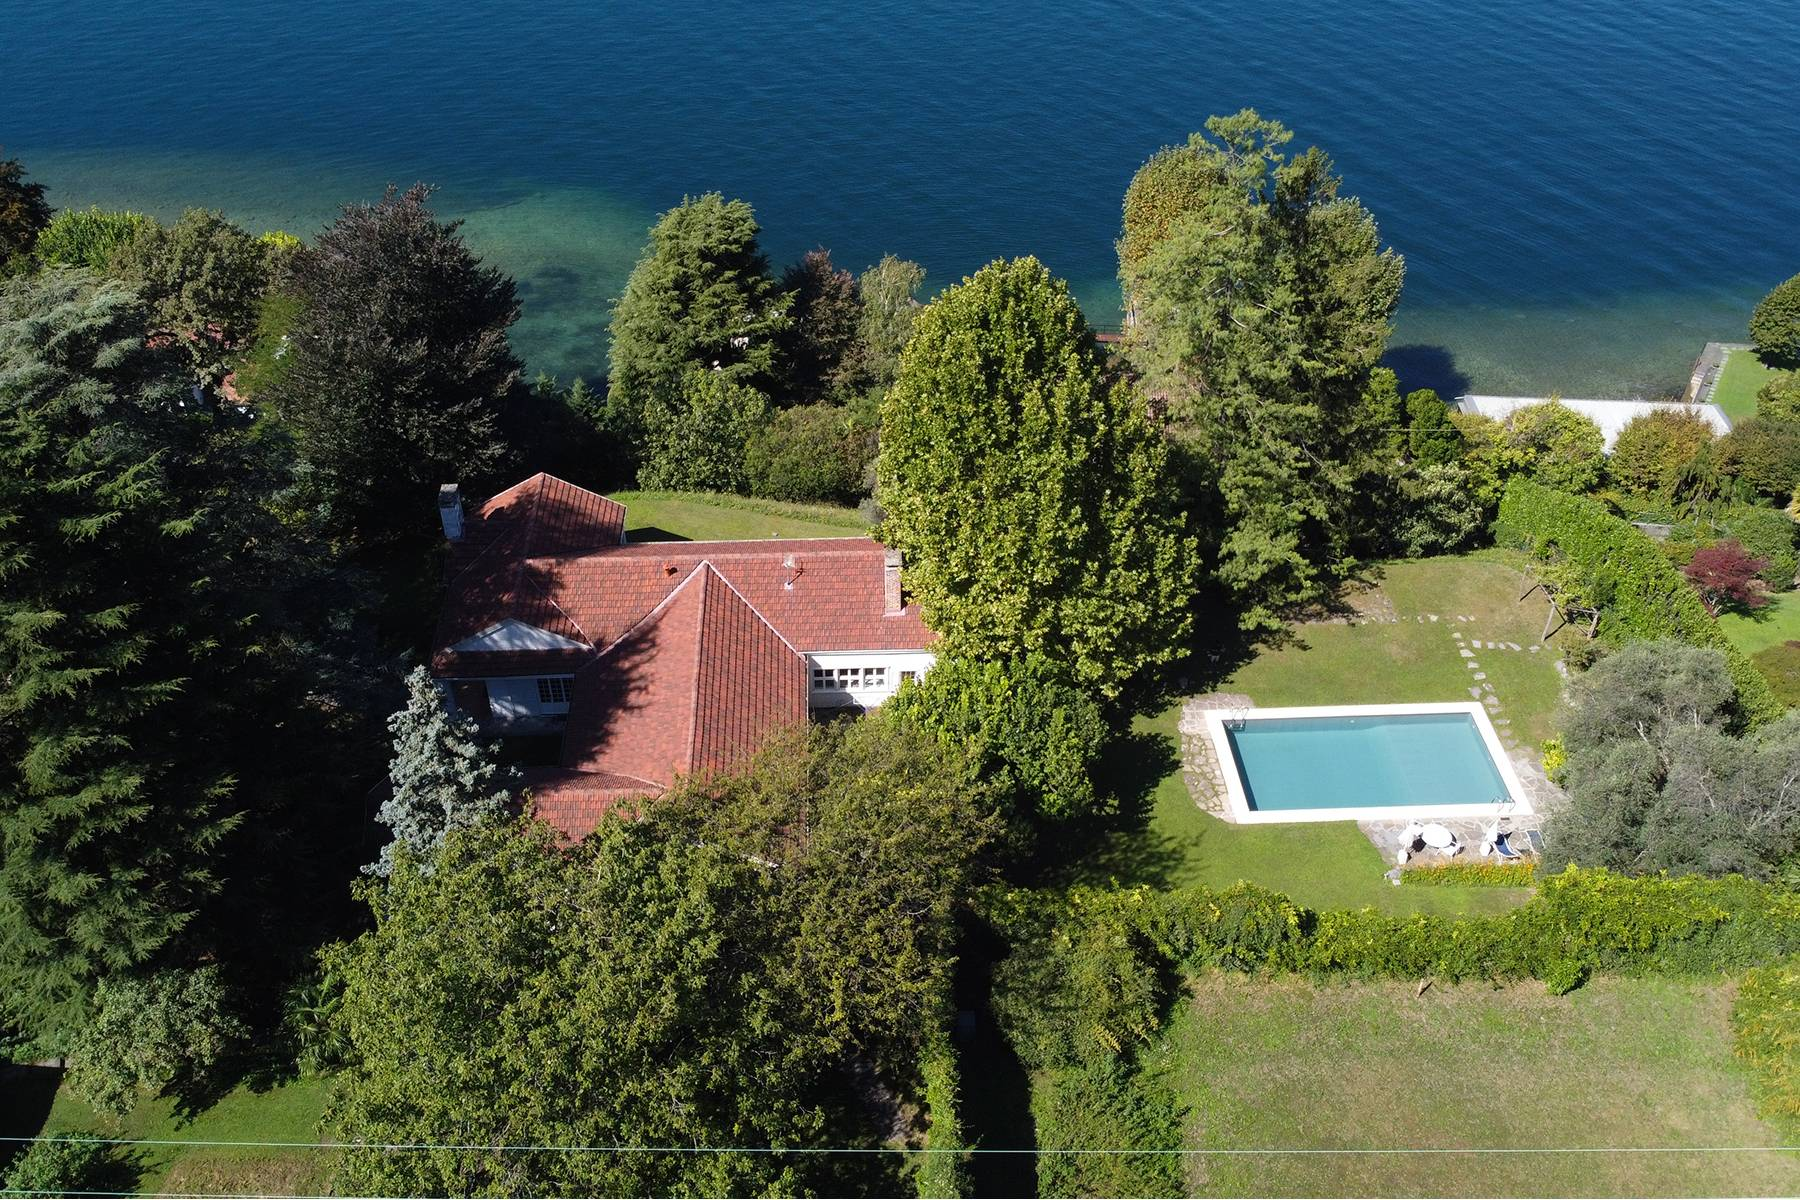 Splendida villa d'epoca con vista lago mozzafiato - 2